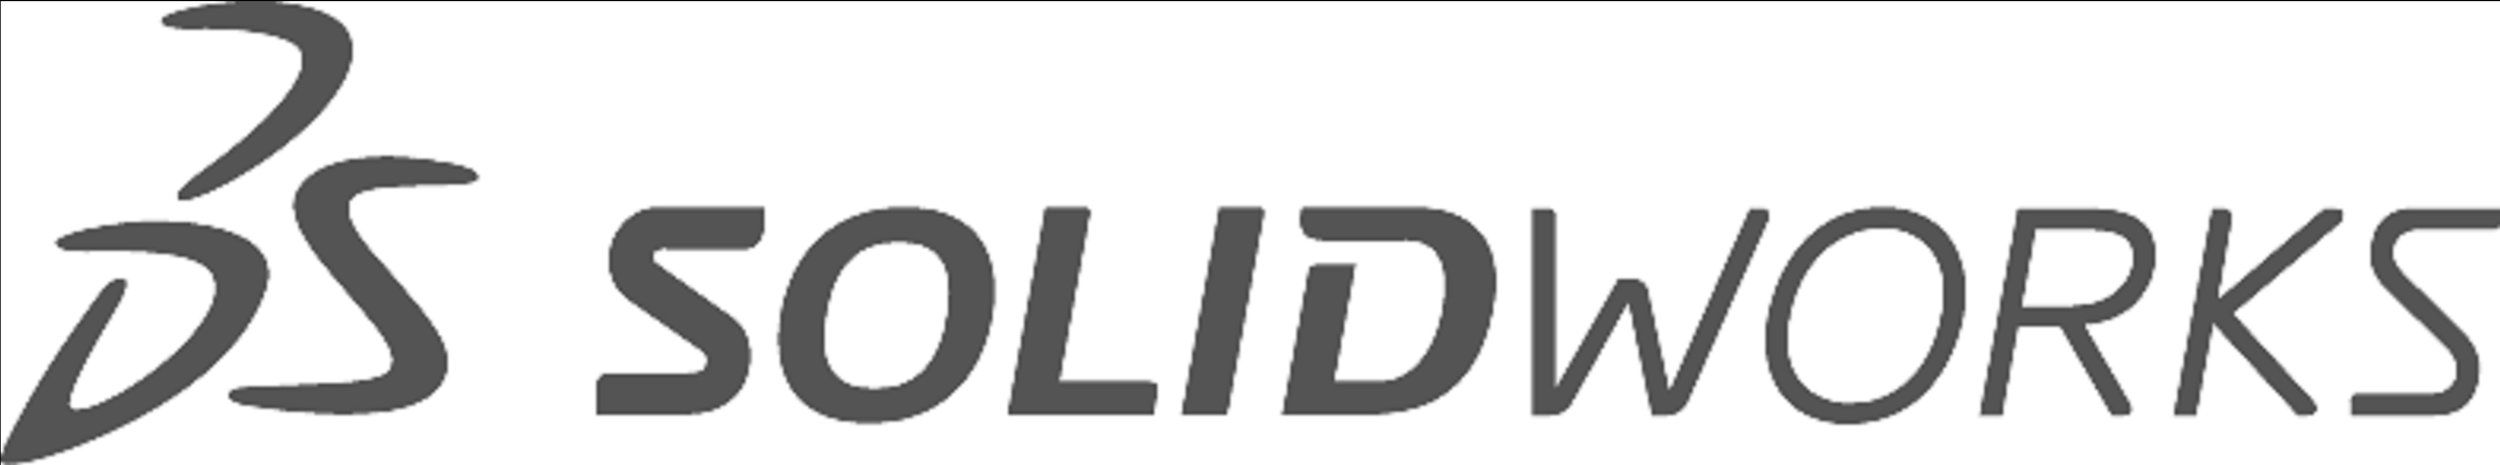 DS-SolidWorks-BnW-Logo.jpg